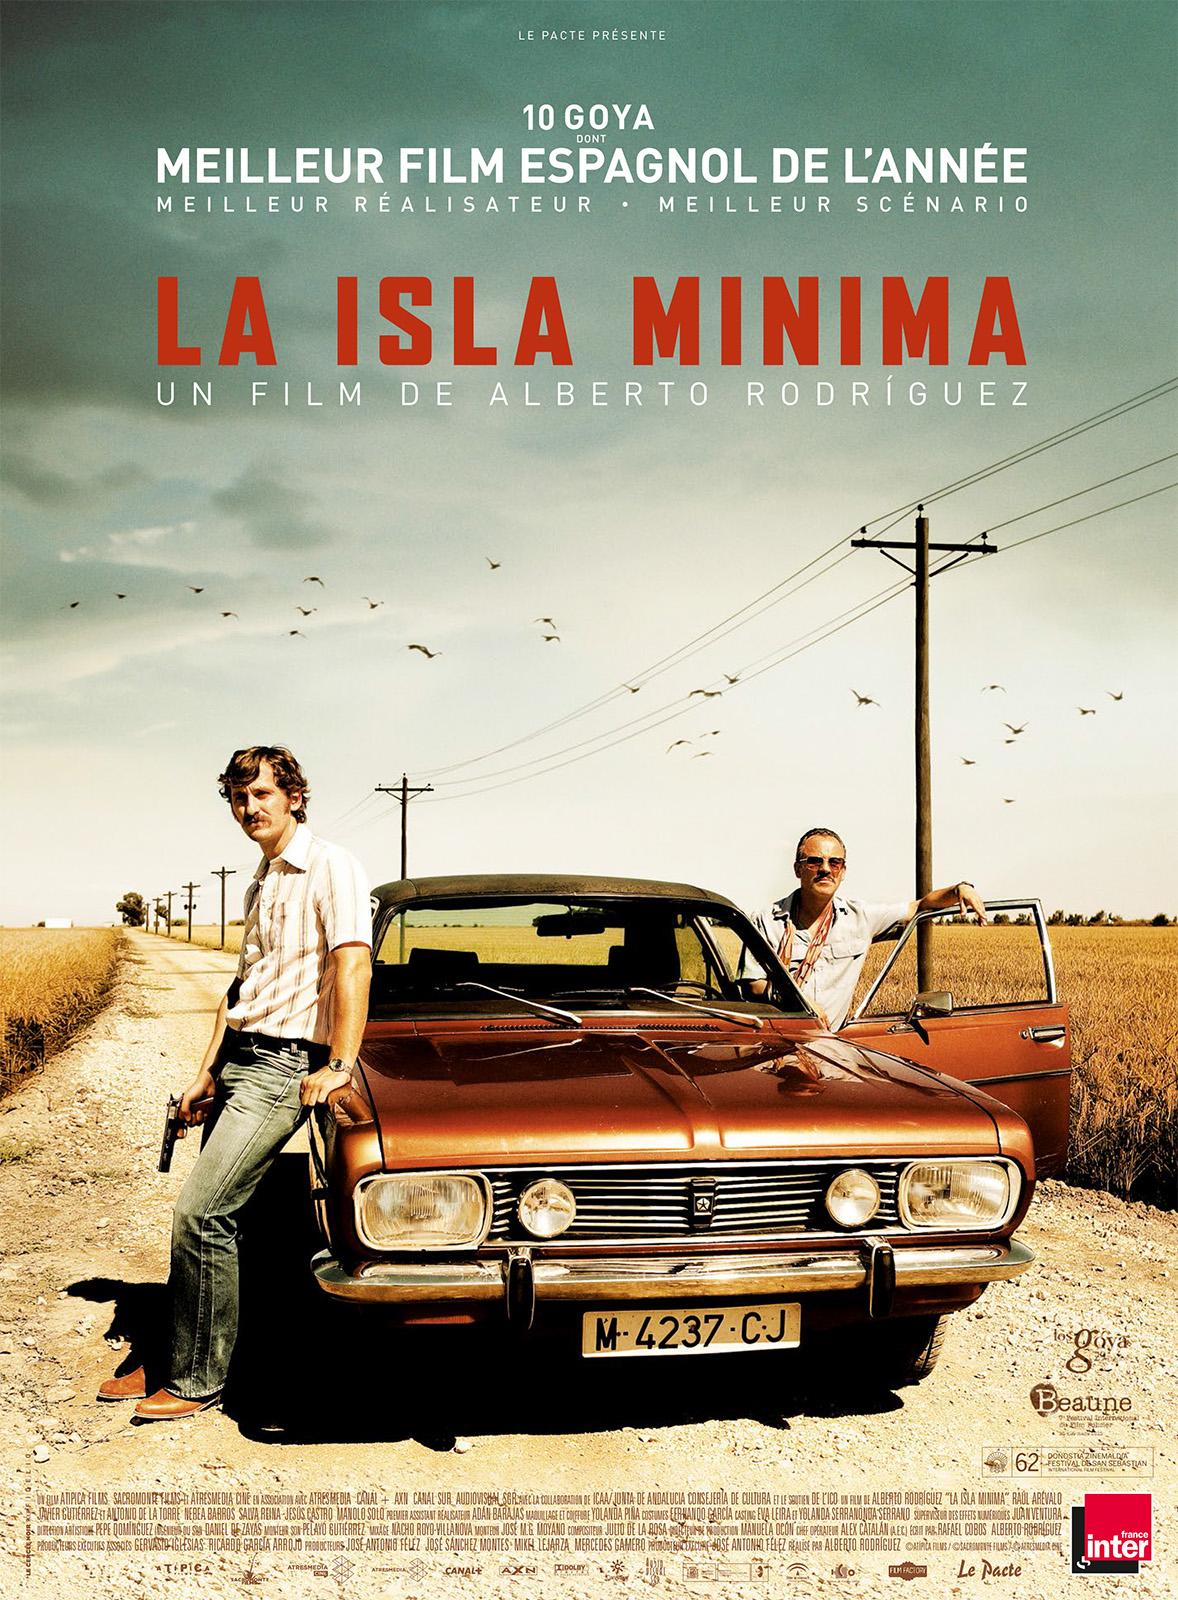 La isla minima d'Alberto Rodriguez